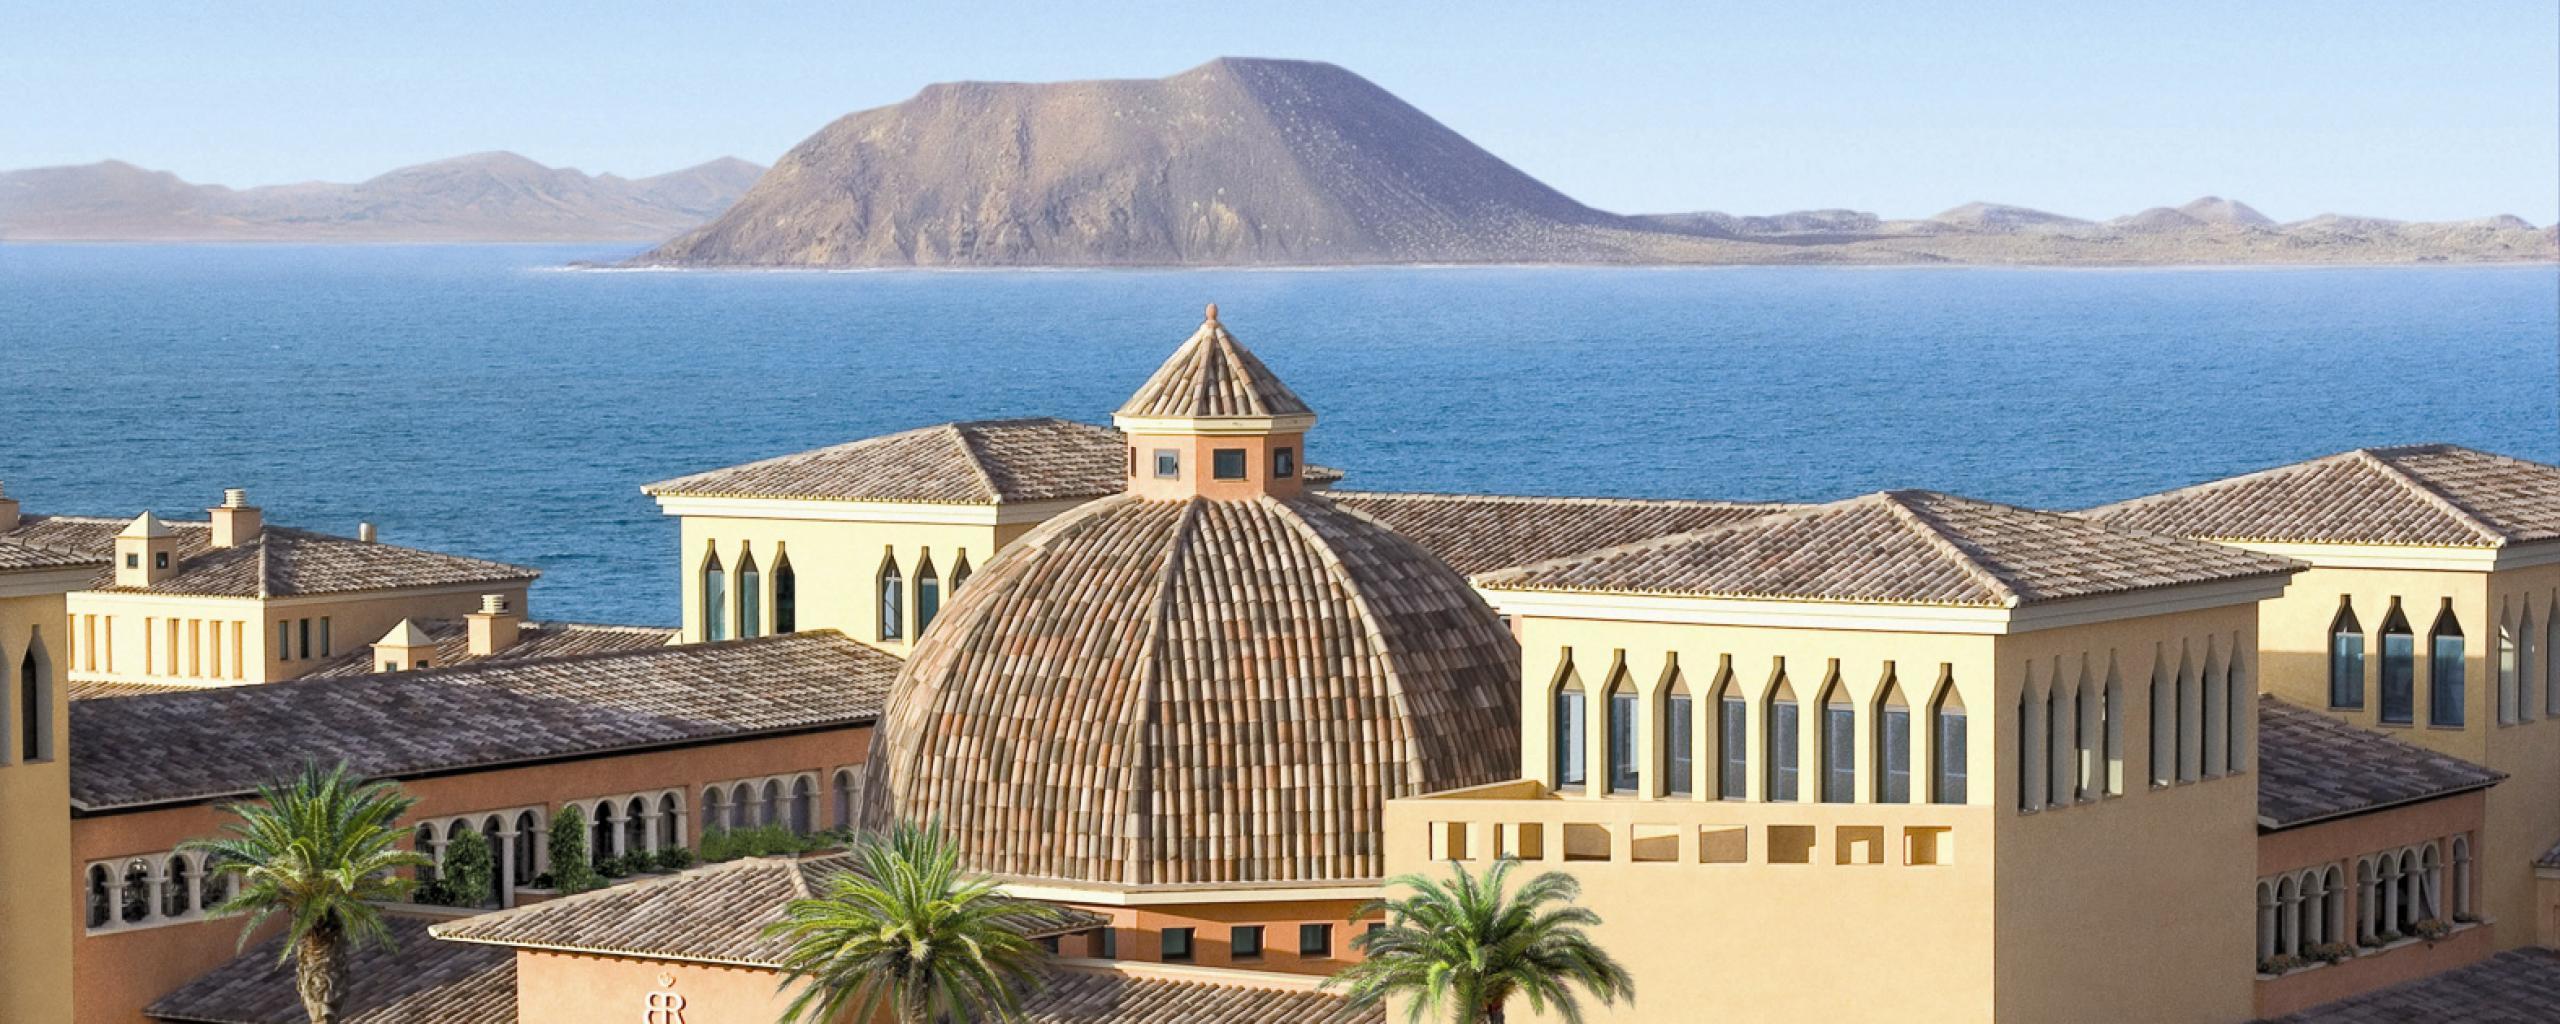 Gran Hotel Atlantis Bahia Real Fuerteventura Gate To Travel